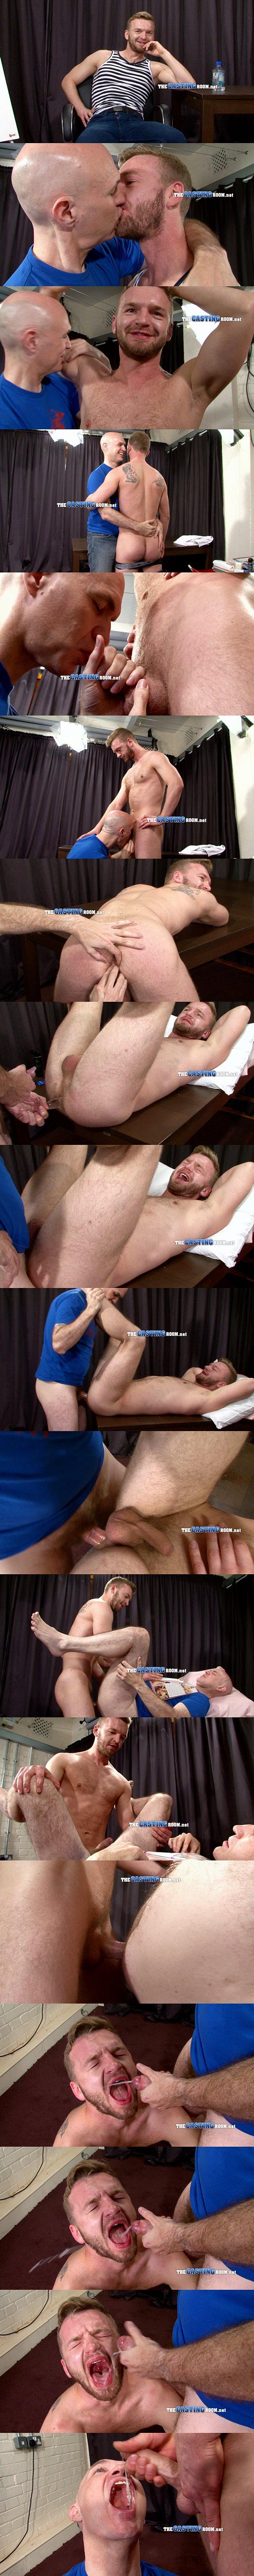 Thecastingroom - Jurgis & Adrian flip-fuck 02